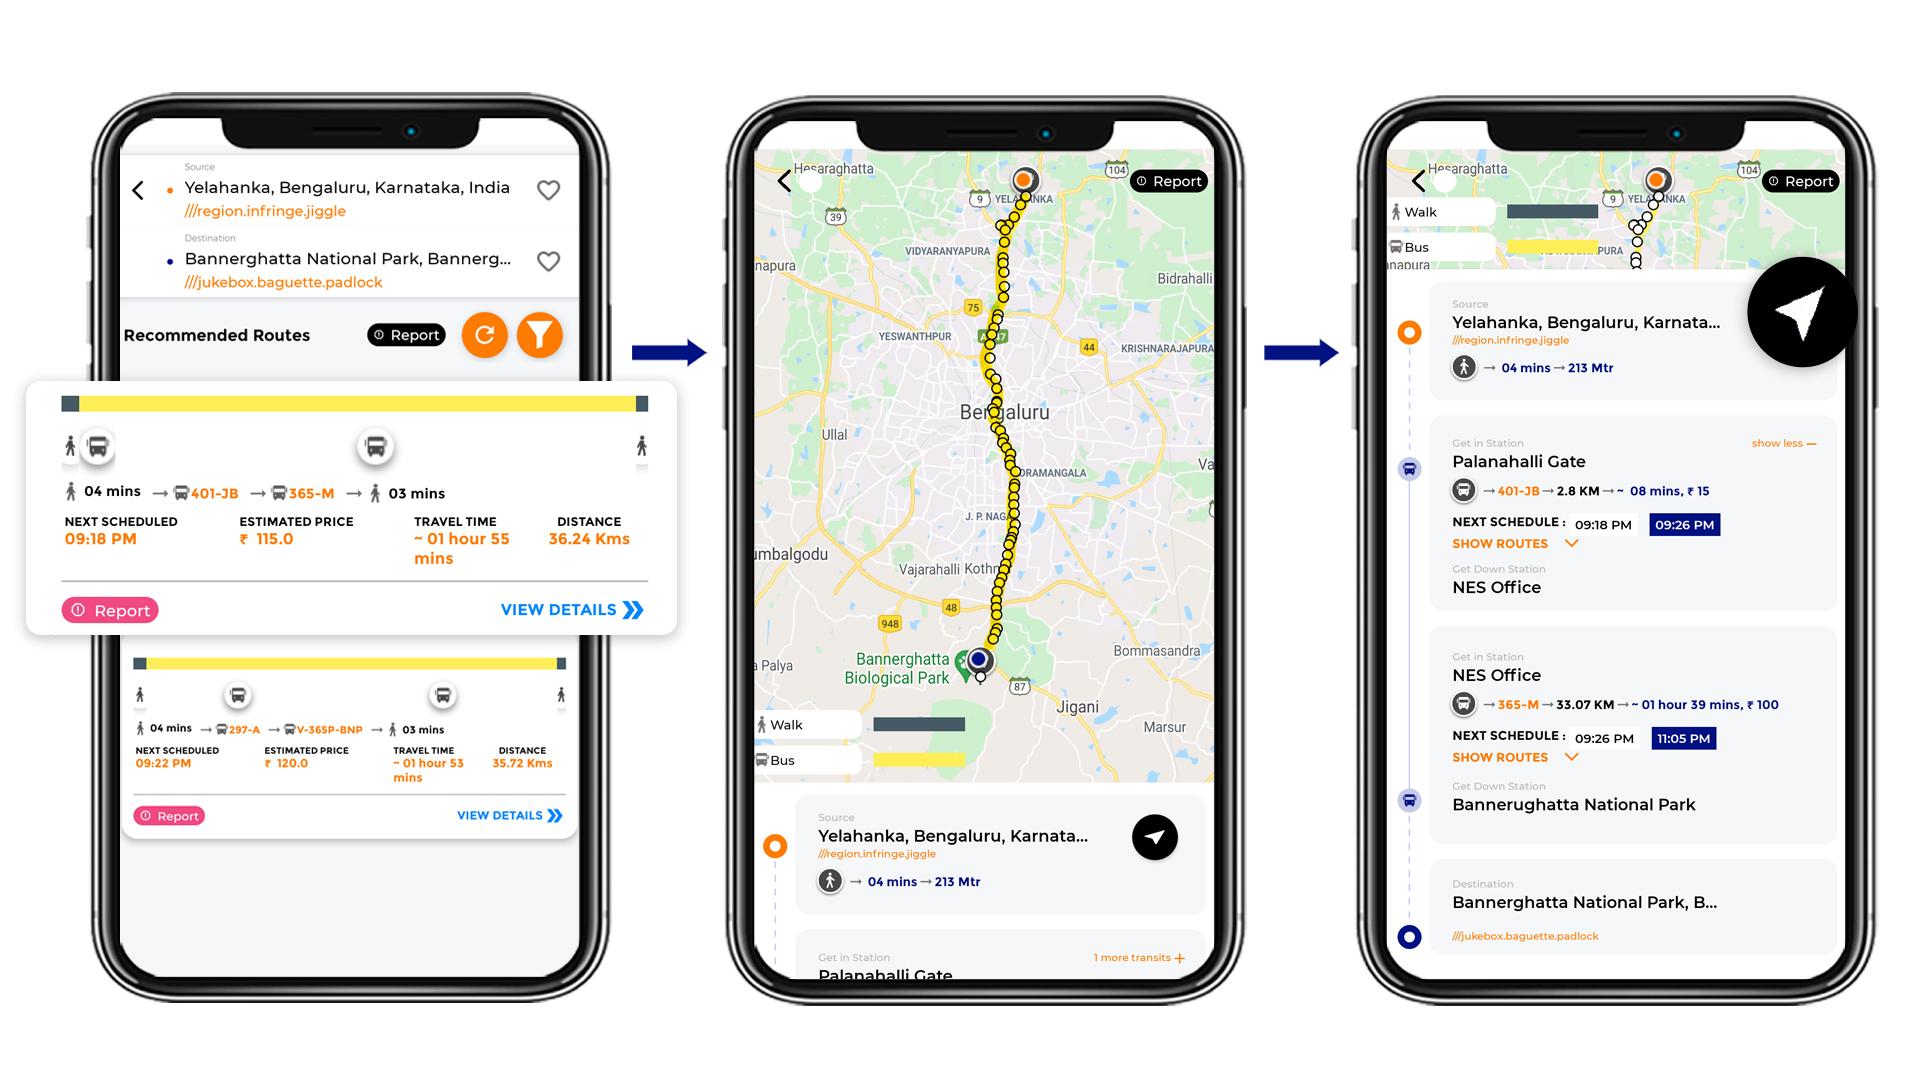 Tummoc, Tummoc app, Bannerghatta National Park, Public transport information, Yelahanka